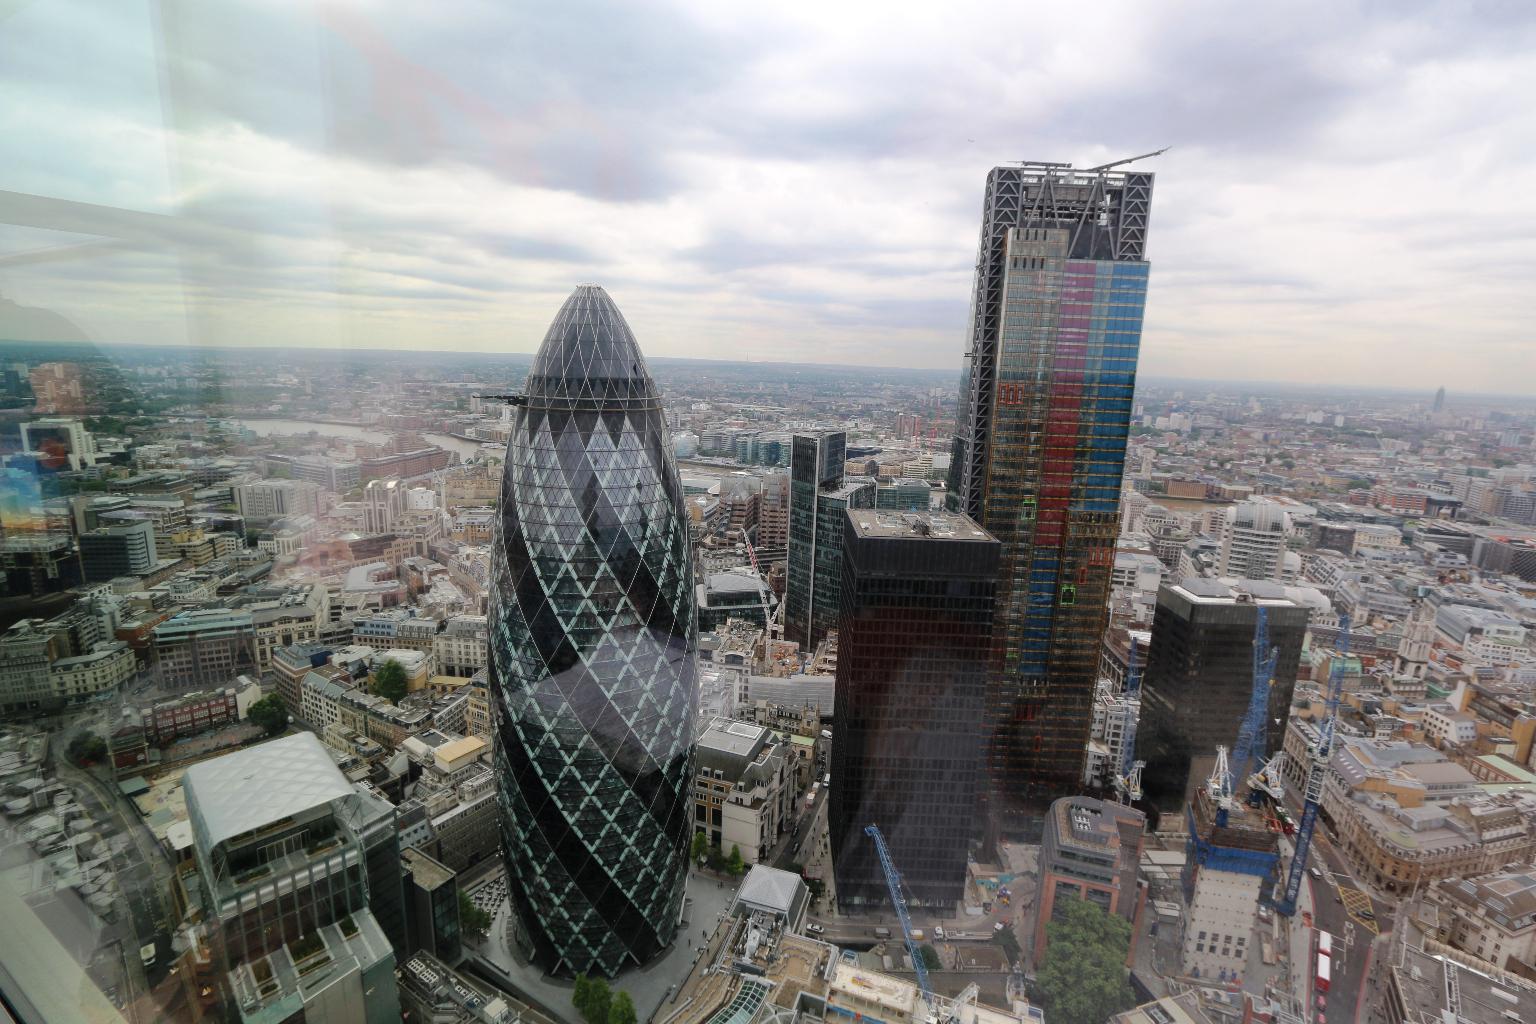 LONDRA THEOLDNOW (2)